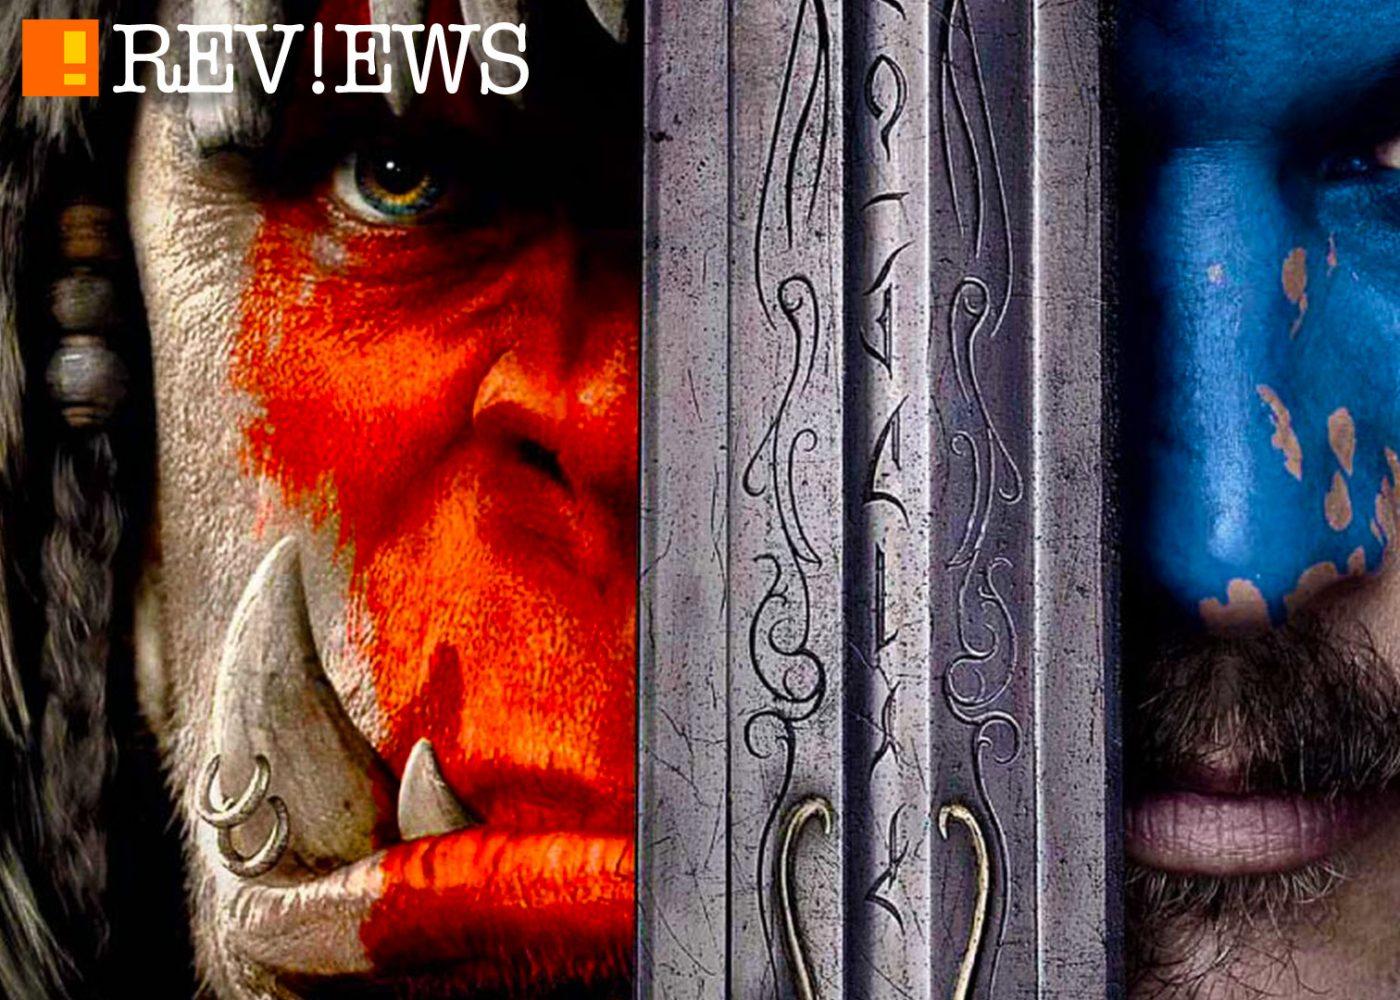 tap reviews, warcraft, blackhand, THE ACTION PIXEL,entertainment on tap, world of warcraft, blizzard entertainment, legendary,wrynn,duncan jones